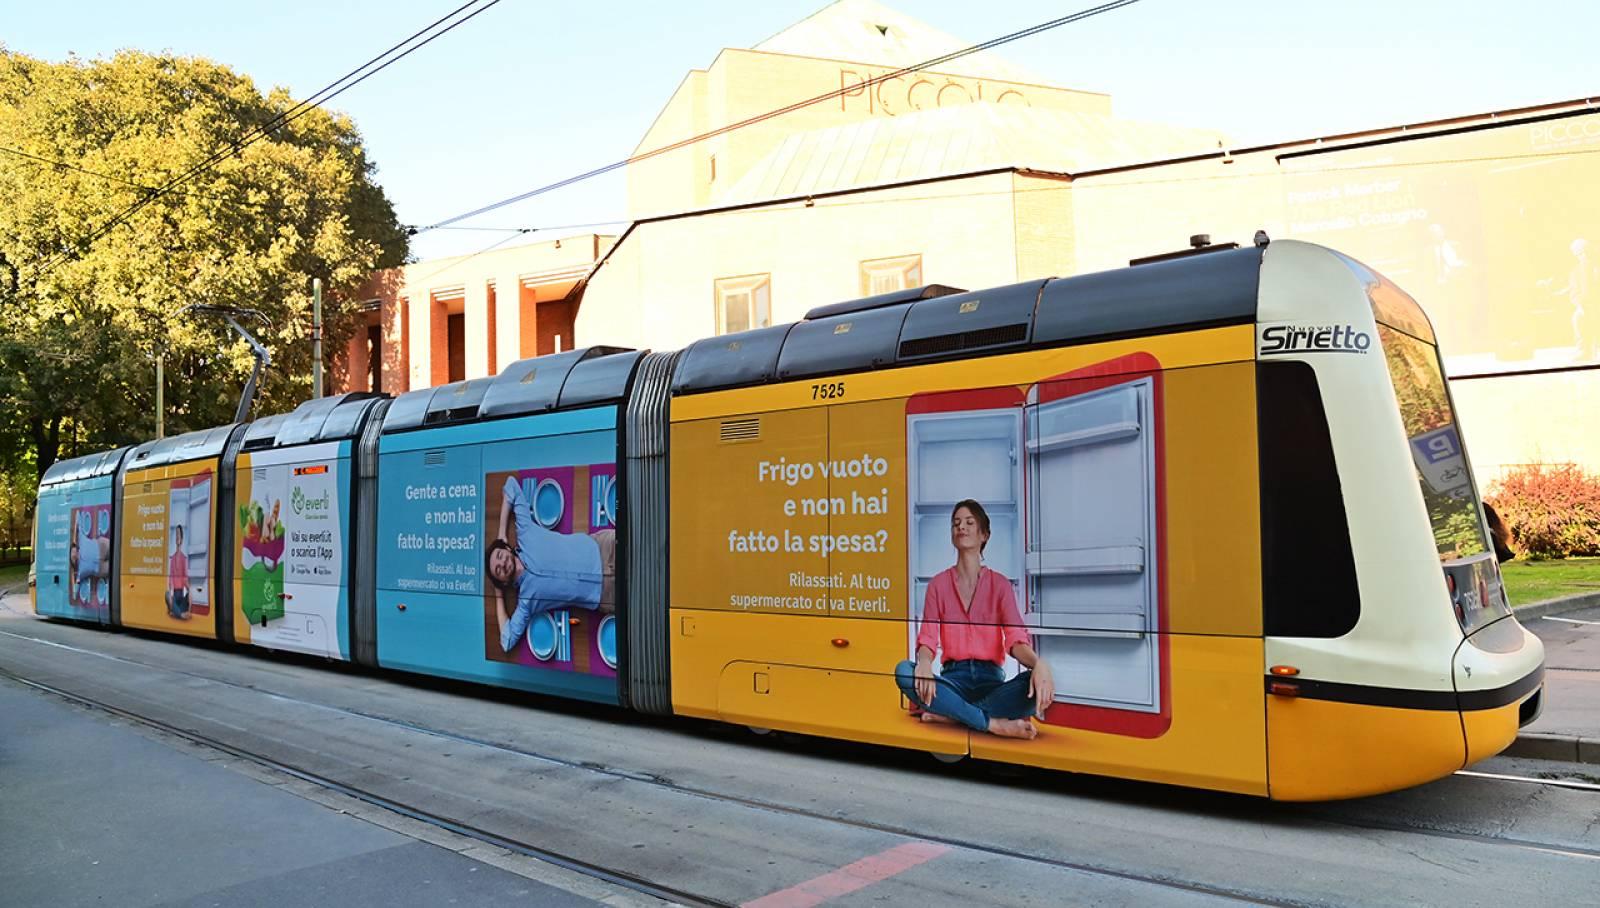 IGPDecaux Milano pubblicità su tram Full-Wrap per Everli